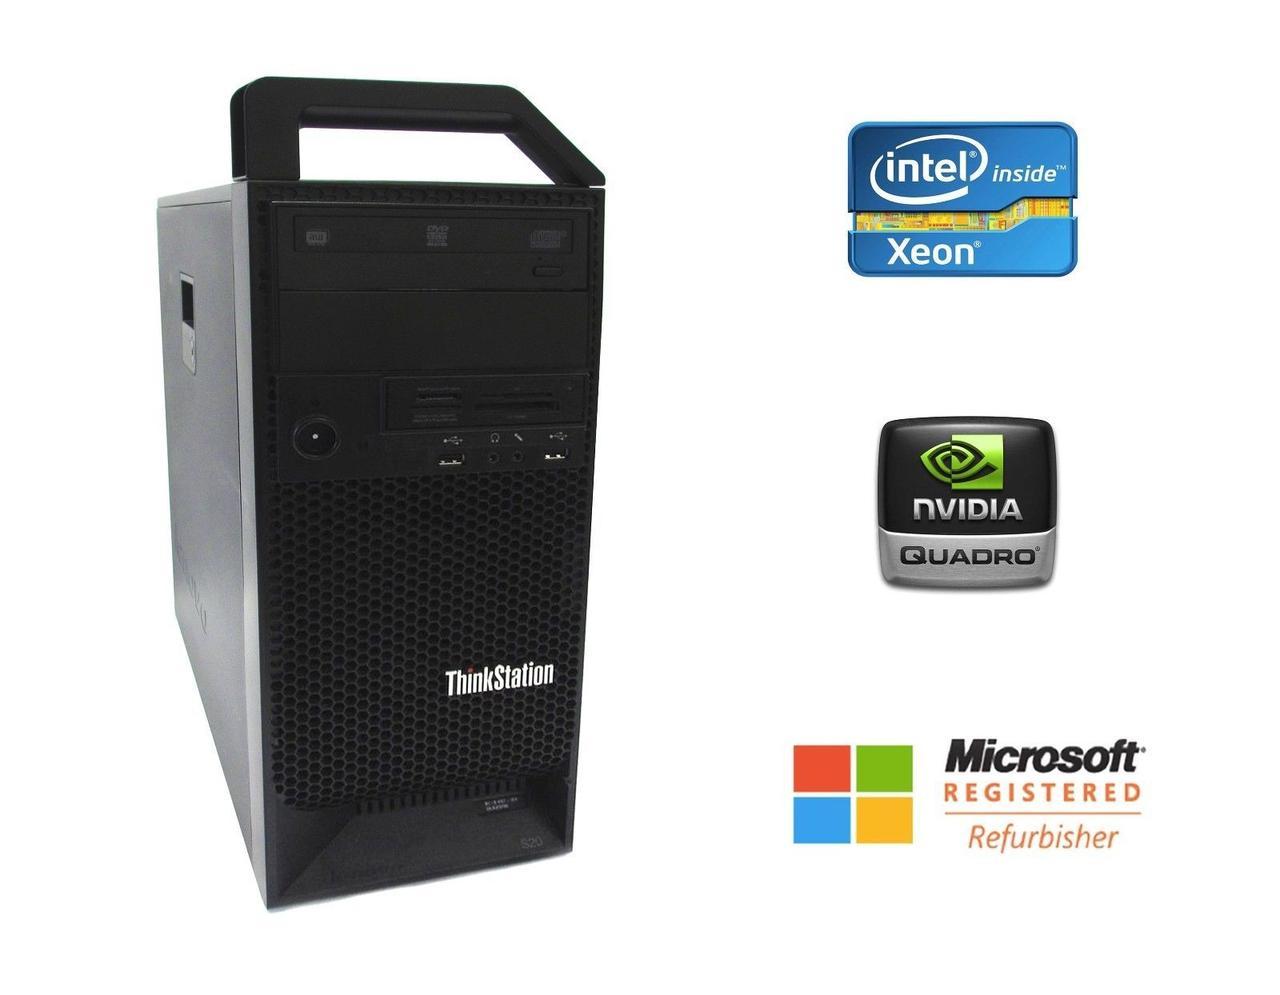 Lenovo ThinkStation D20 Workstation / 2x Intel Xeon E5620 / 8 ГБ ddr3 / 250 ГБ hdd / Nvidia Quadro 2000 / 1030 Вт